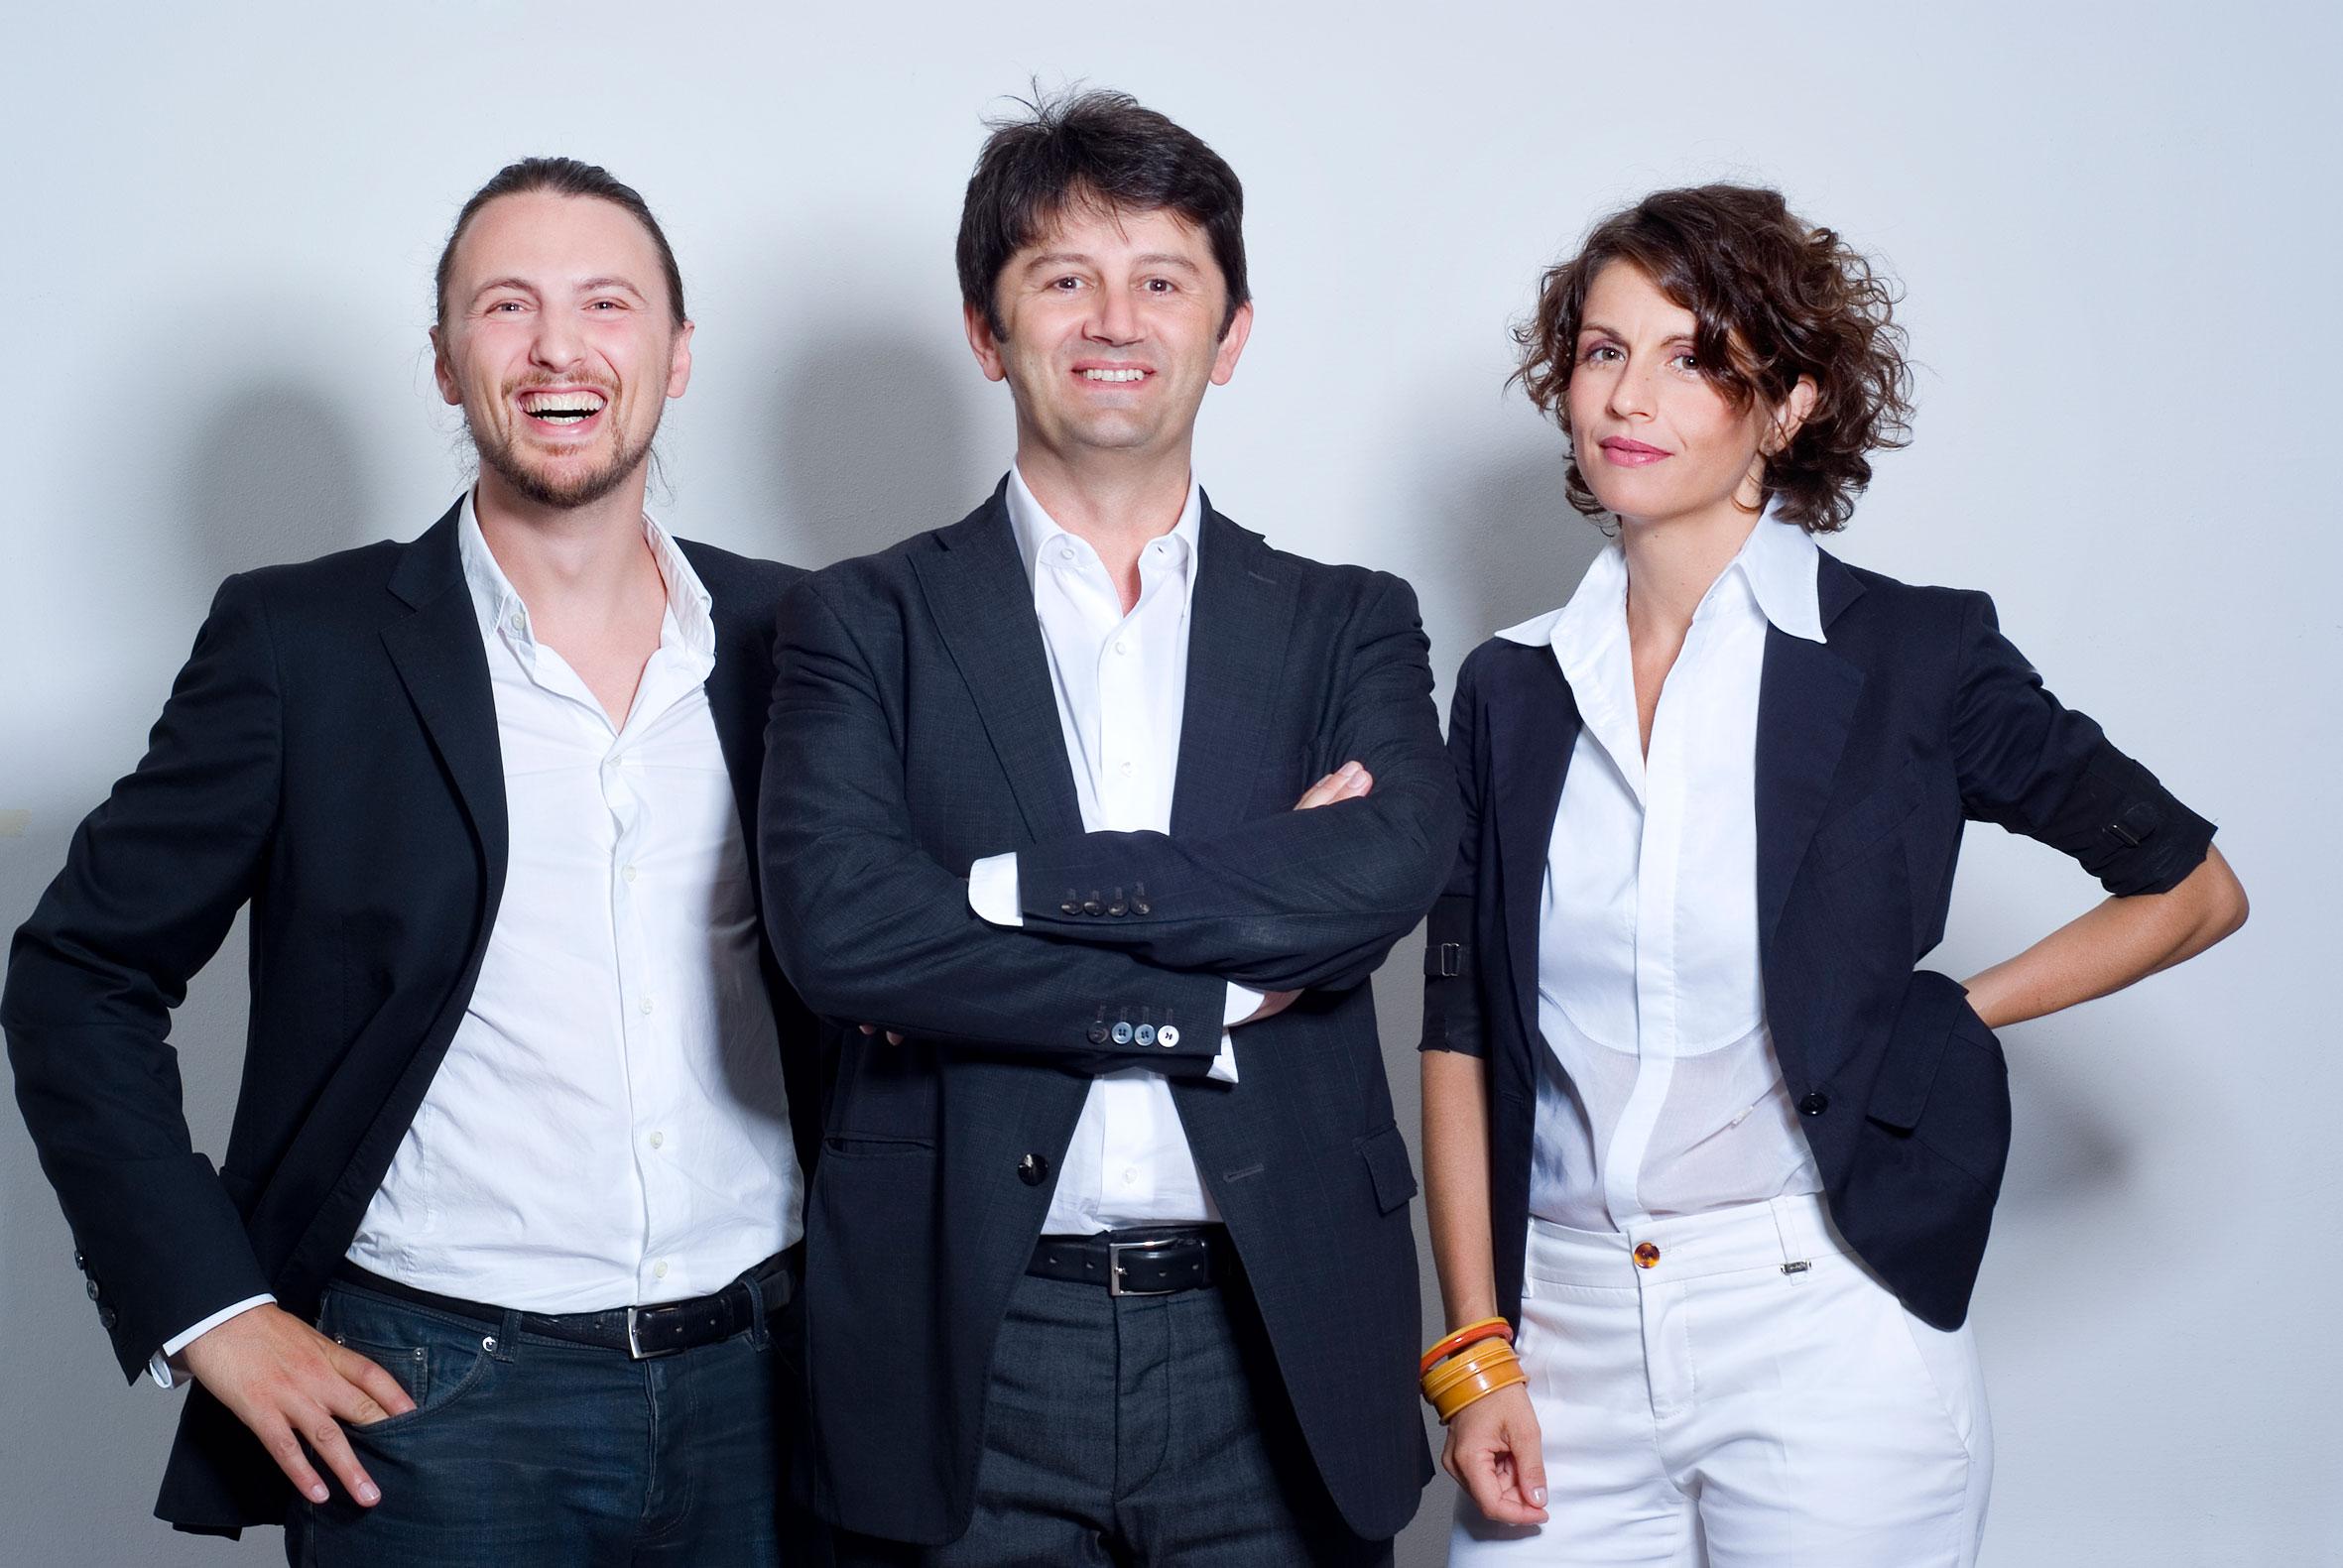 Andrea-Luccaroni-Gabriele-Lelli-Roberta-Bandini